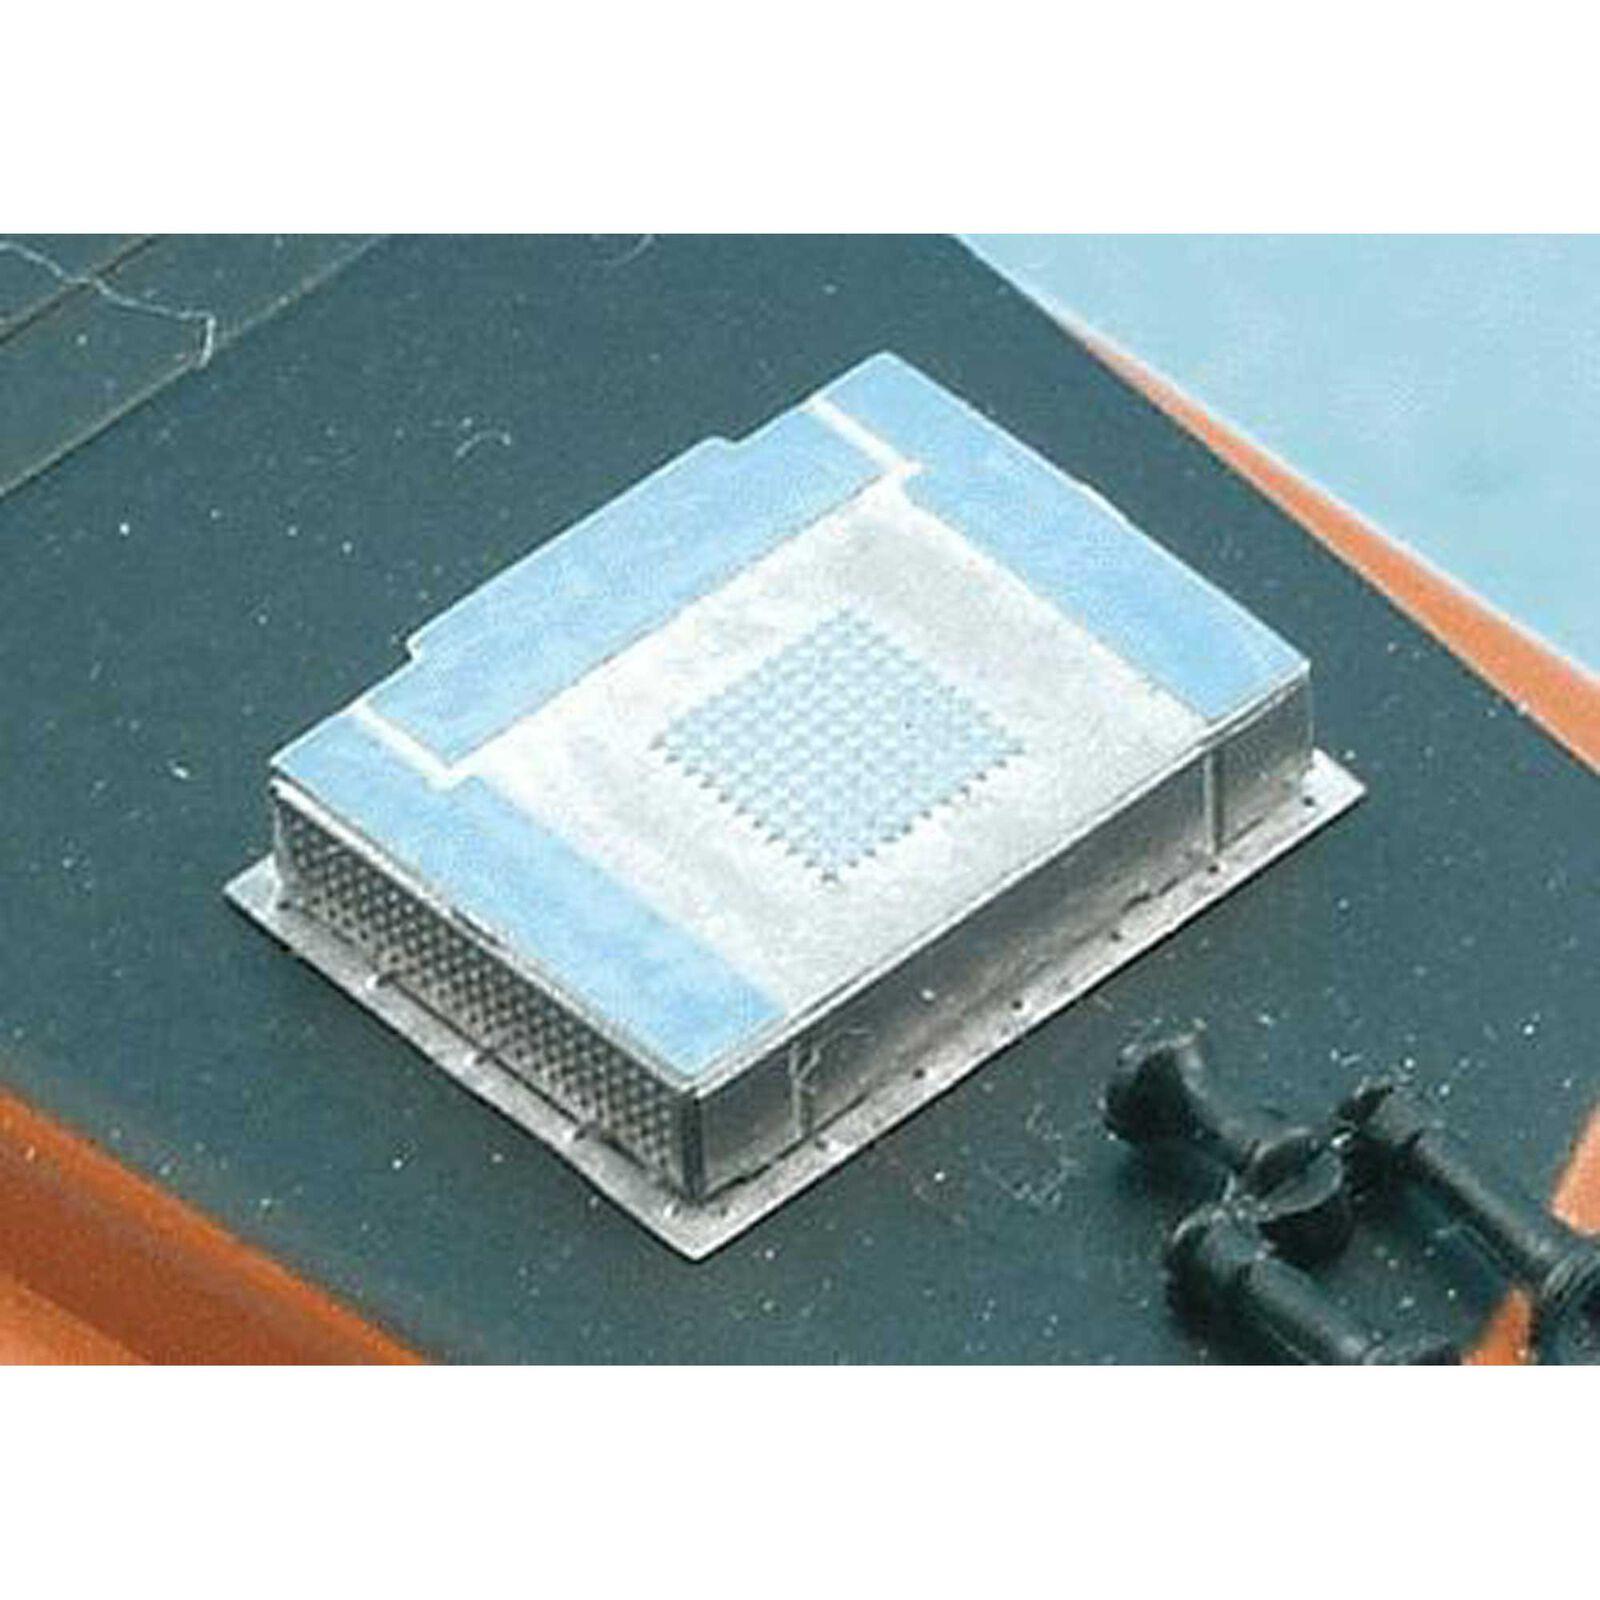 N KIT Air Conditioner, Prime